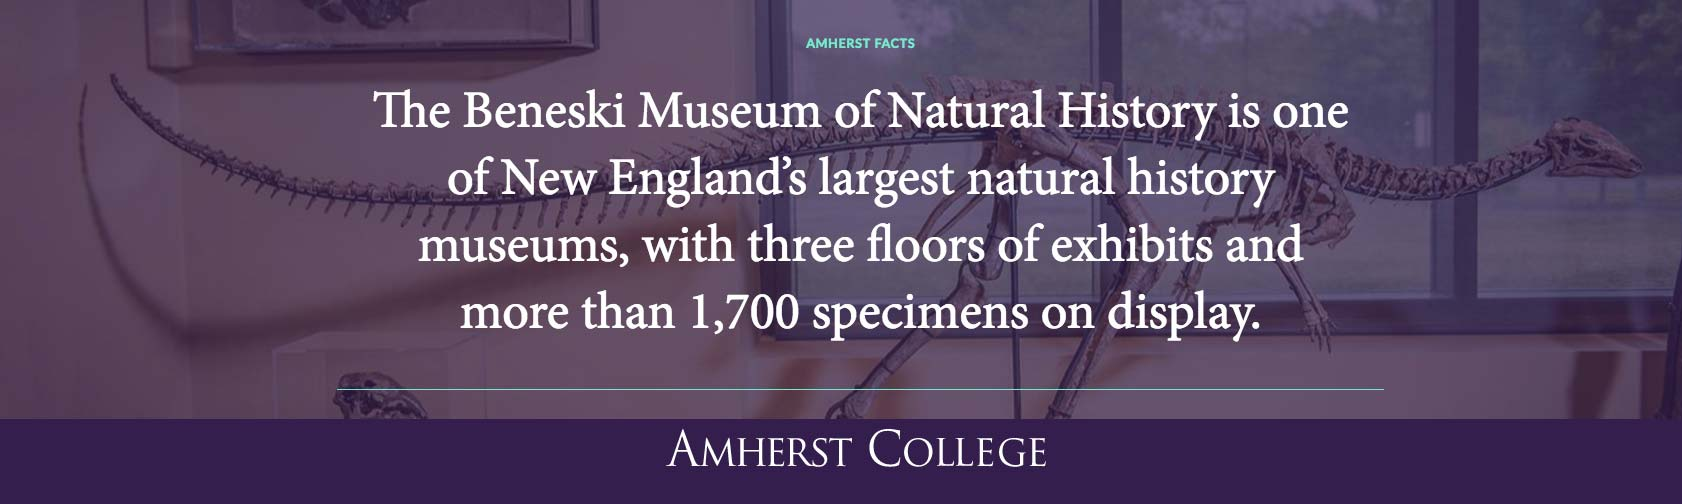 Beneski Museum Fact